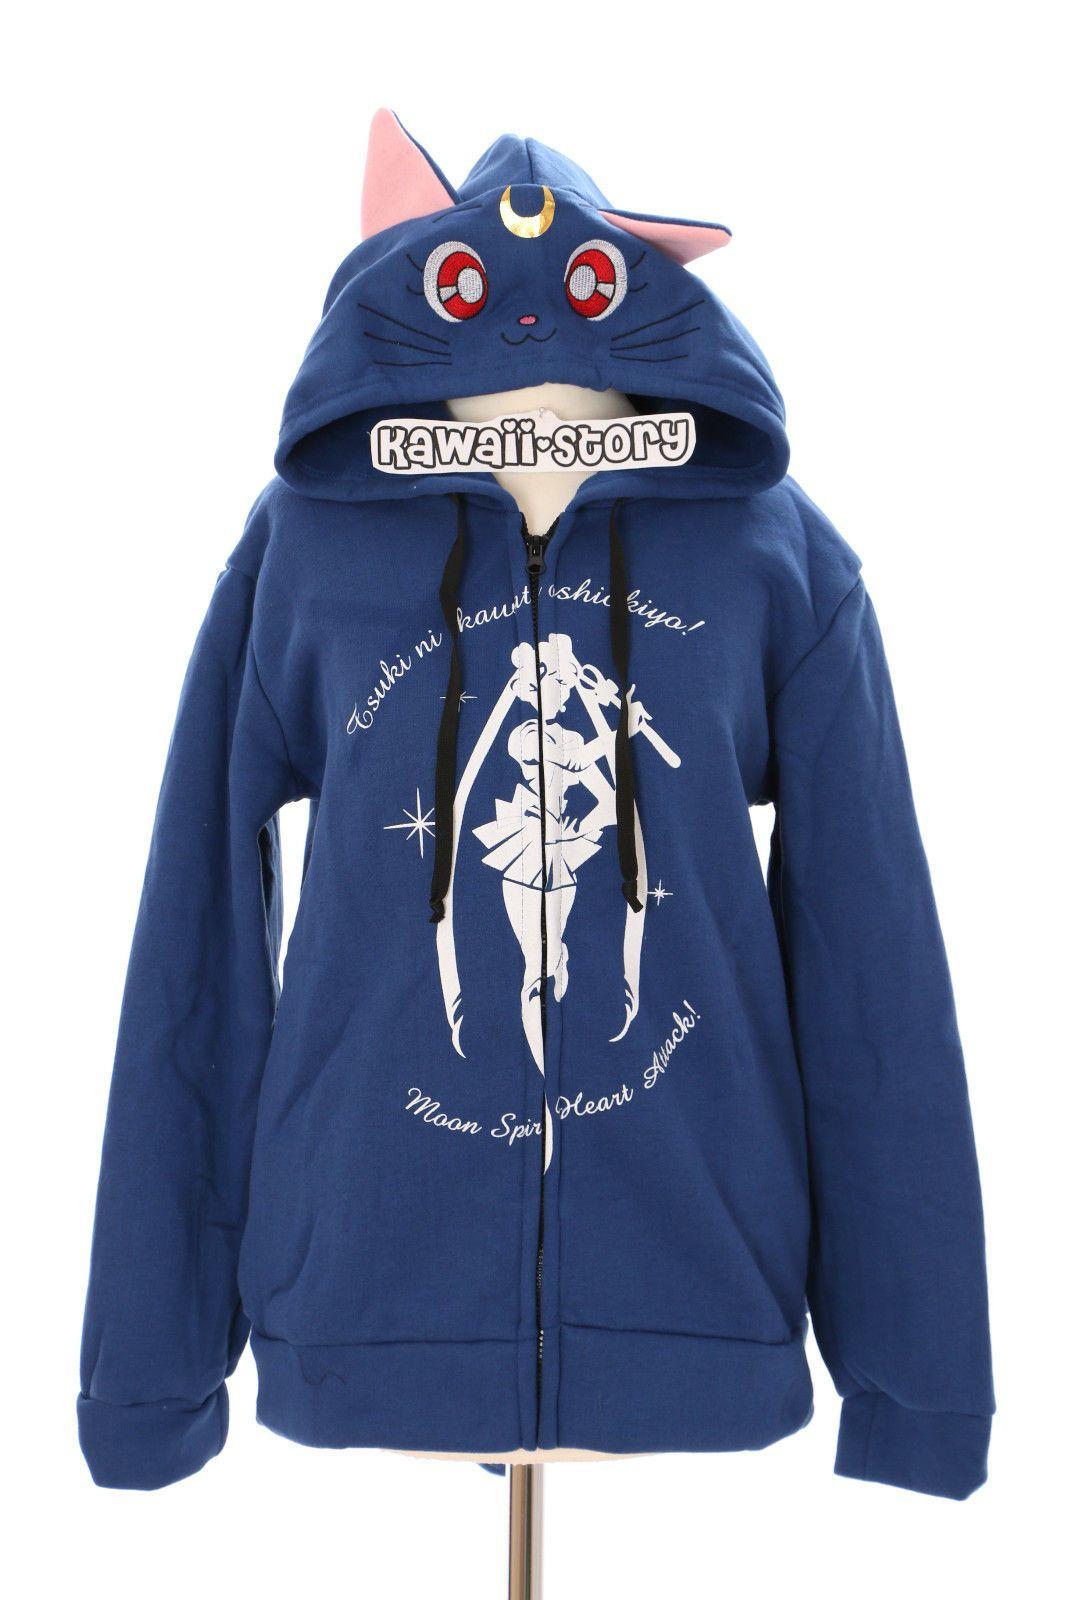 Ta-02 Sailor Moon Neko luna Cat cosplay capucha Sudadera chaqueta suéter  Hoodie… 084e665d289